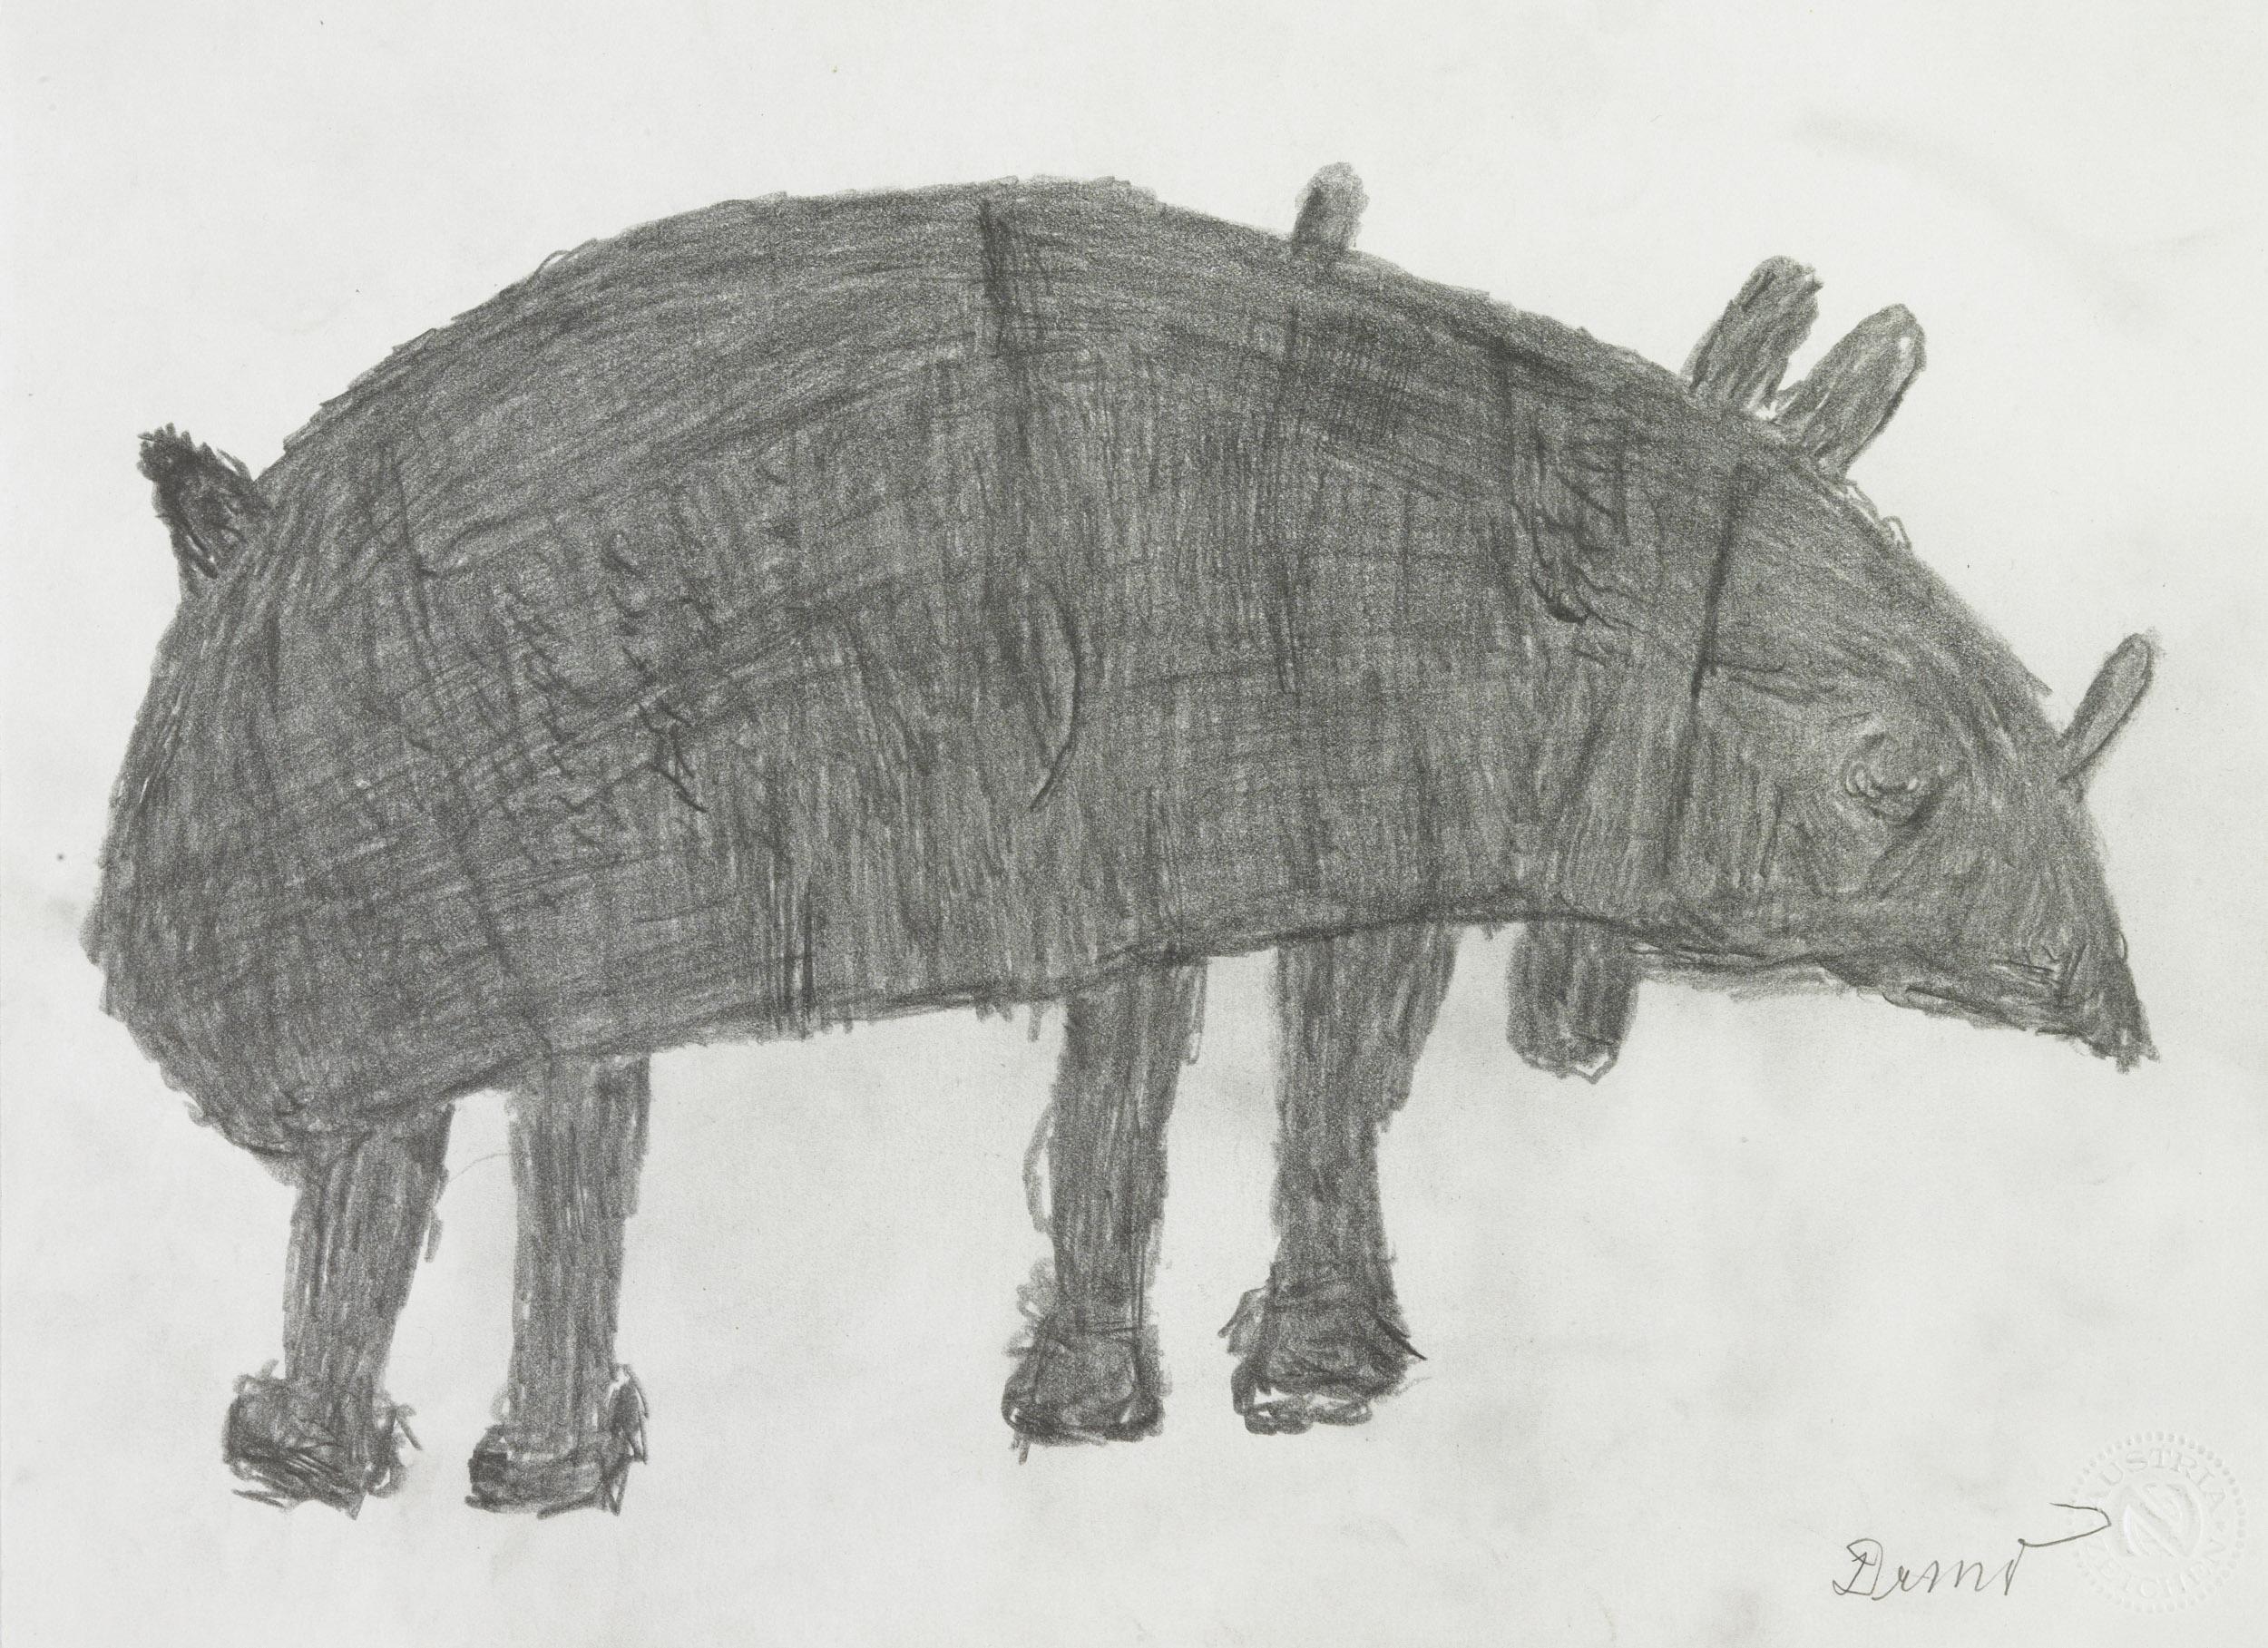 dobay anton - Nashorn / Rhino